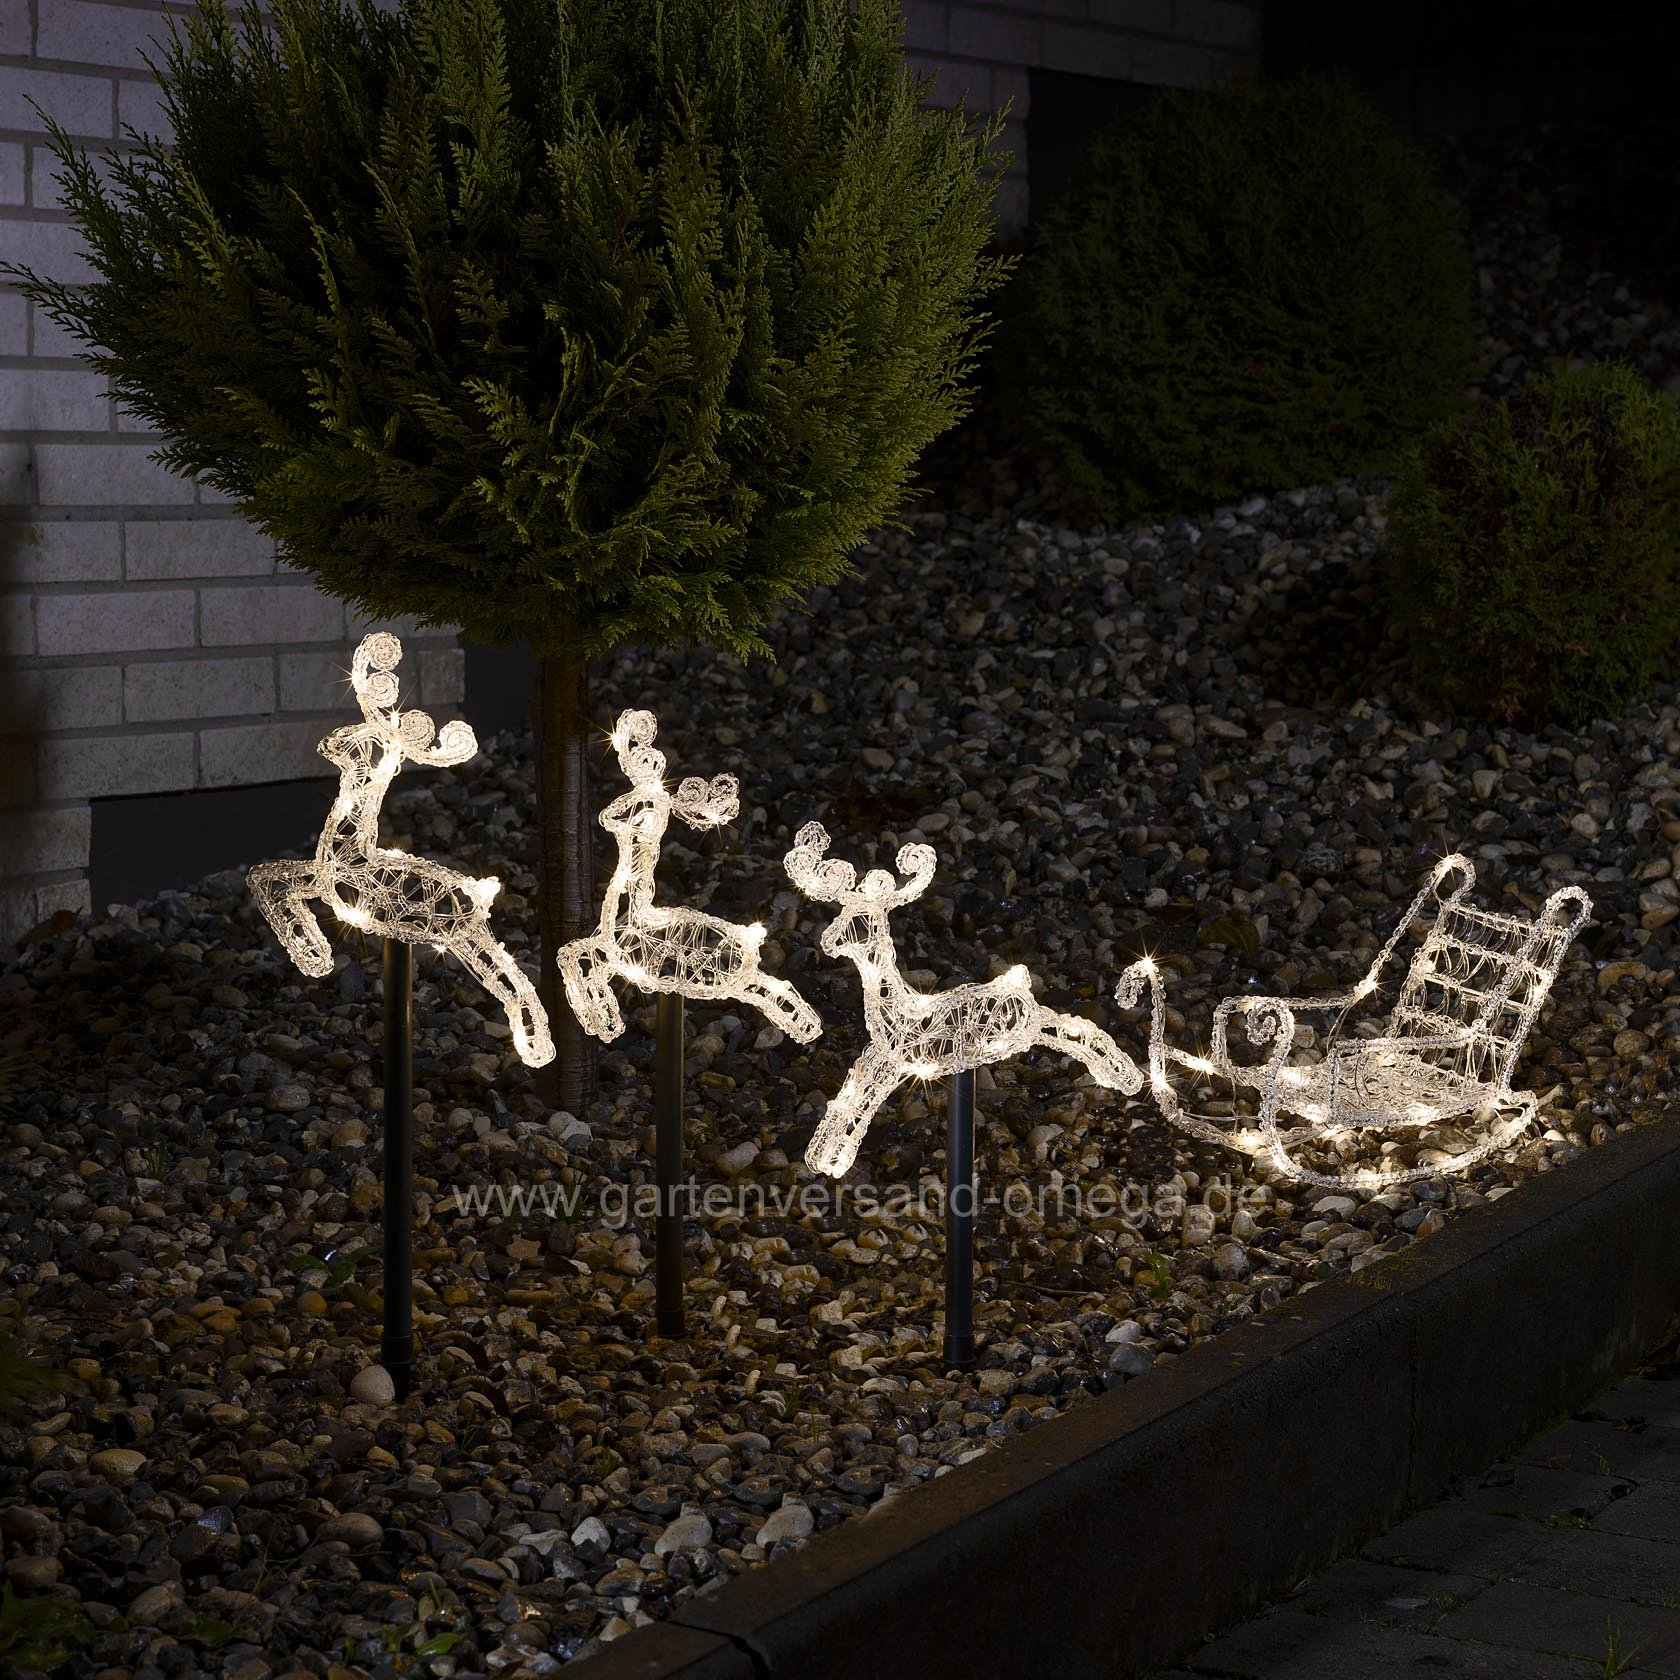 Led acryl set schlitten mit rentieren leuchtst be set - Weihnachtsbeleuchtung garten ...